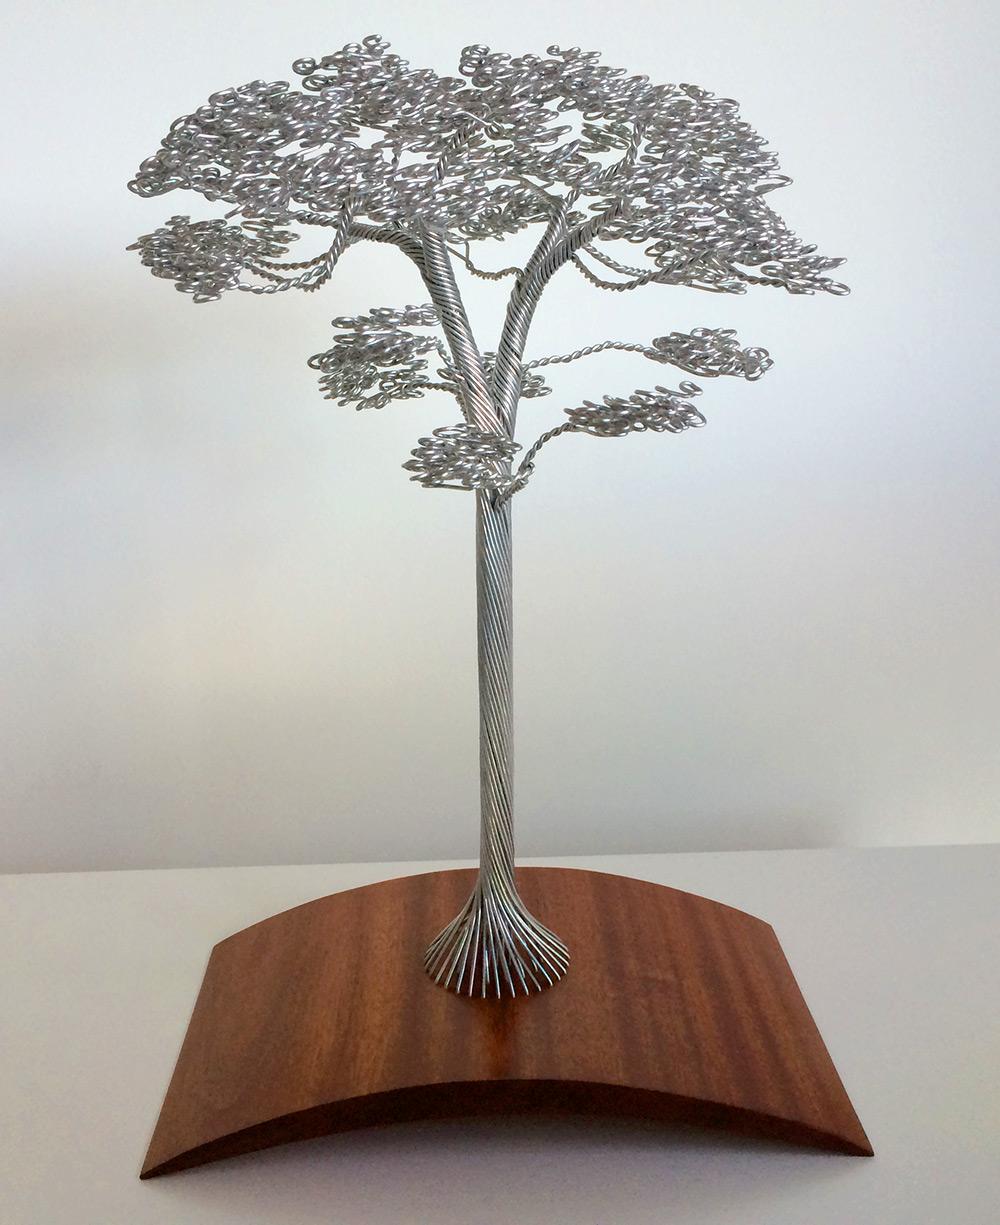 деревья из проволоки картинки место, таких лабиринтах